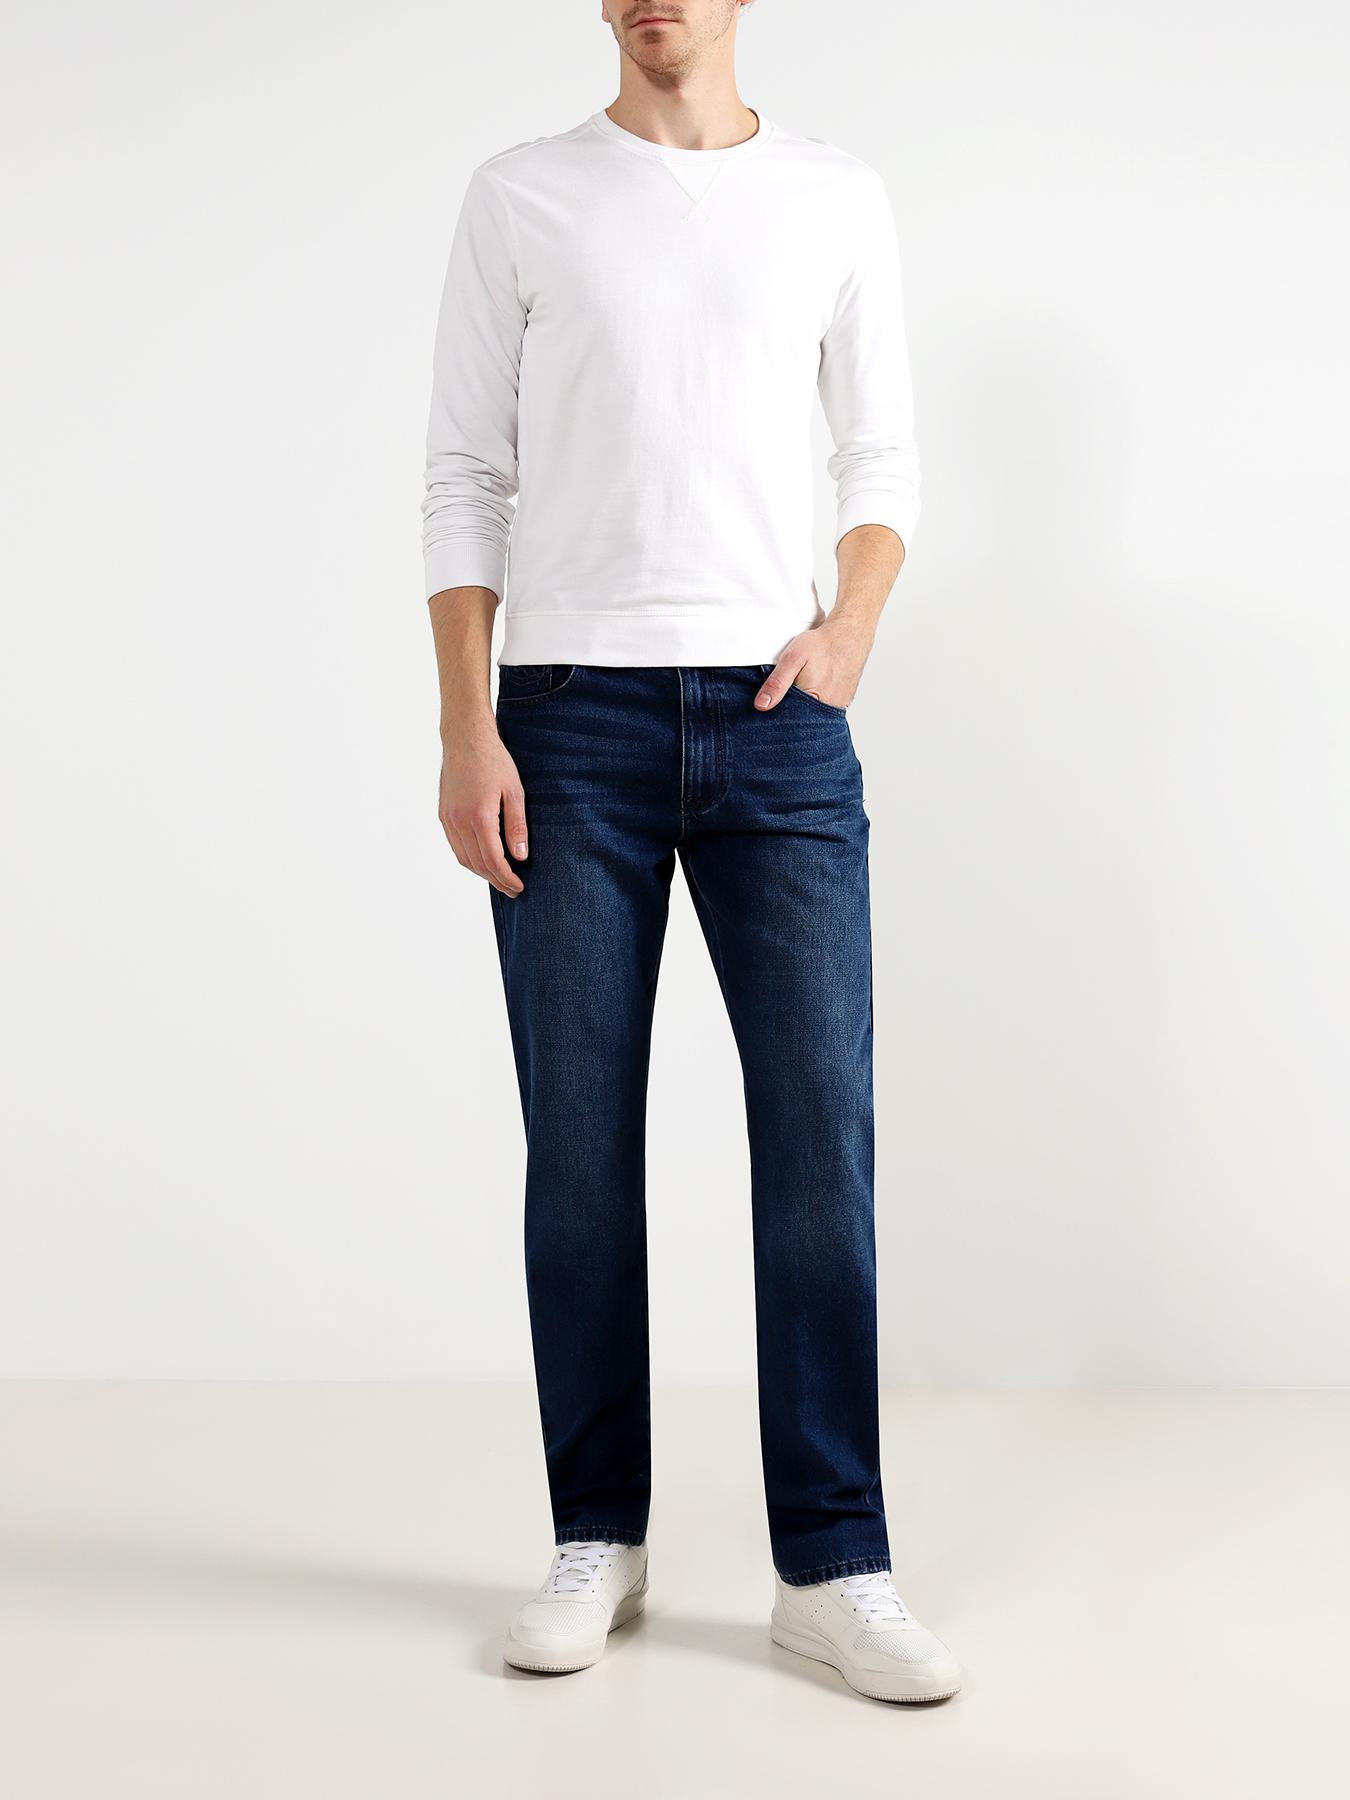 Джинсы Ritter Jeans Прямые джинсы